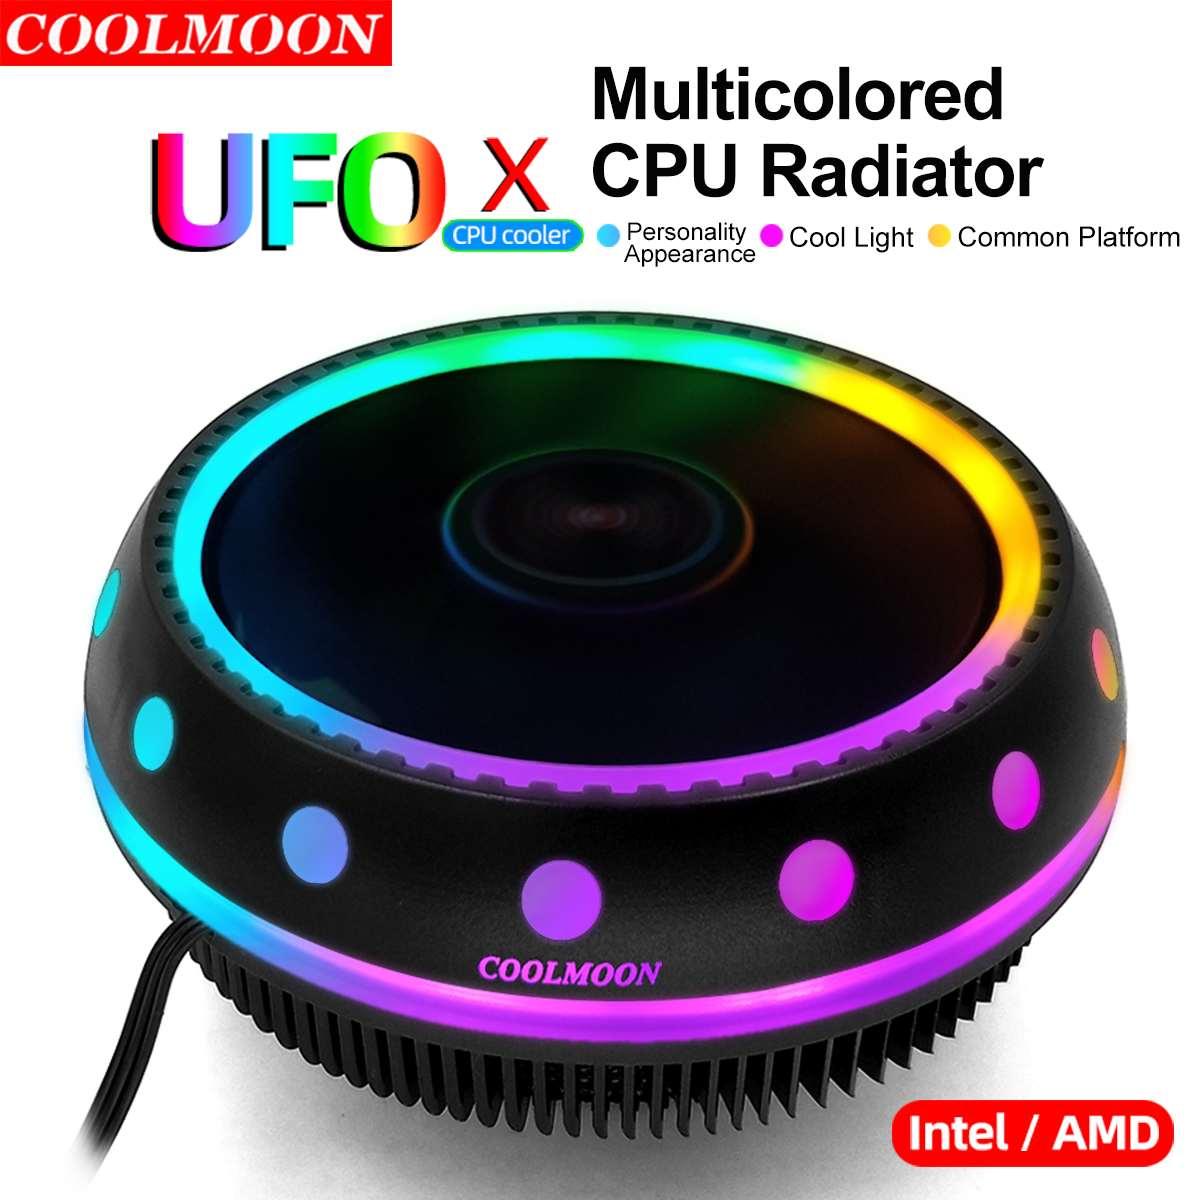 Aluminum 3 Pin CPU Cooler Radiator RGB Heat Sink Silent PC CPU Cooling Cooler Heatsink Fan For Intel LGA/115X/775/1366/AM3/AM4